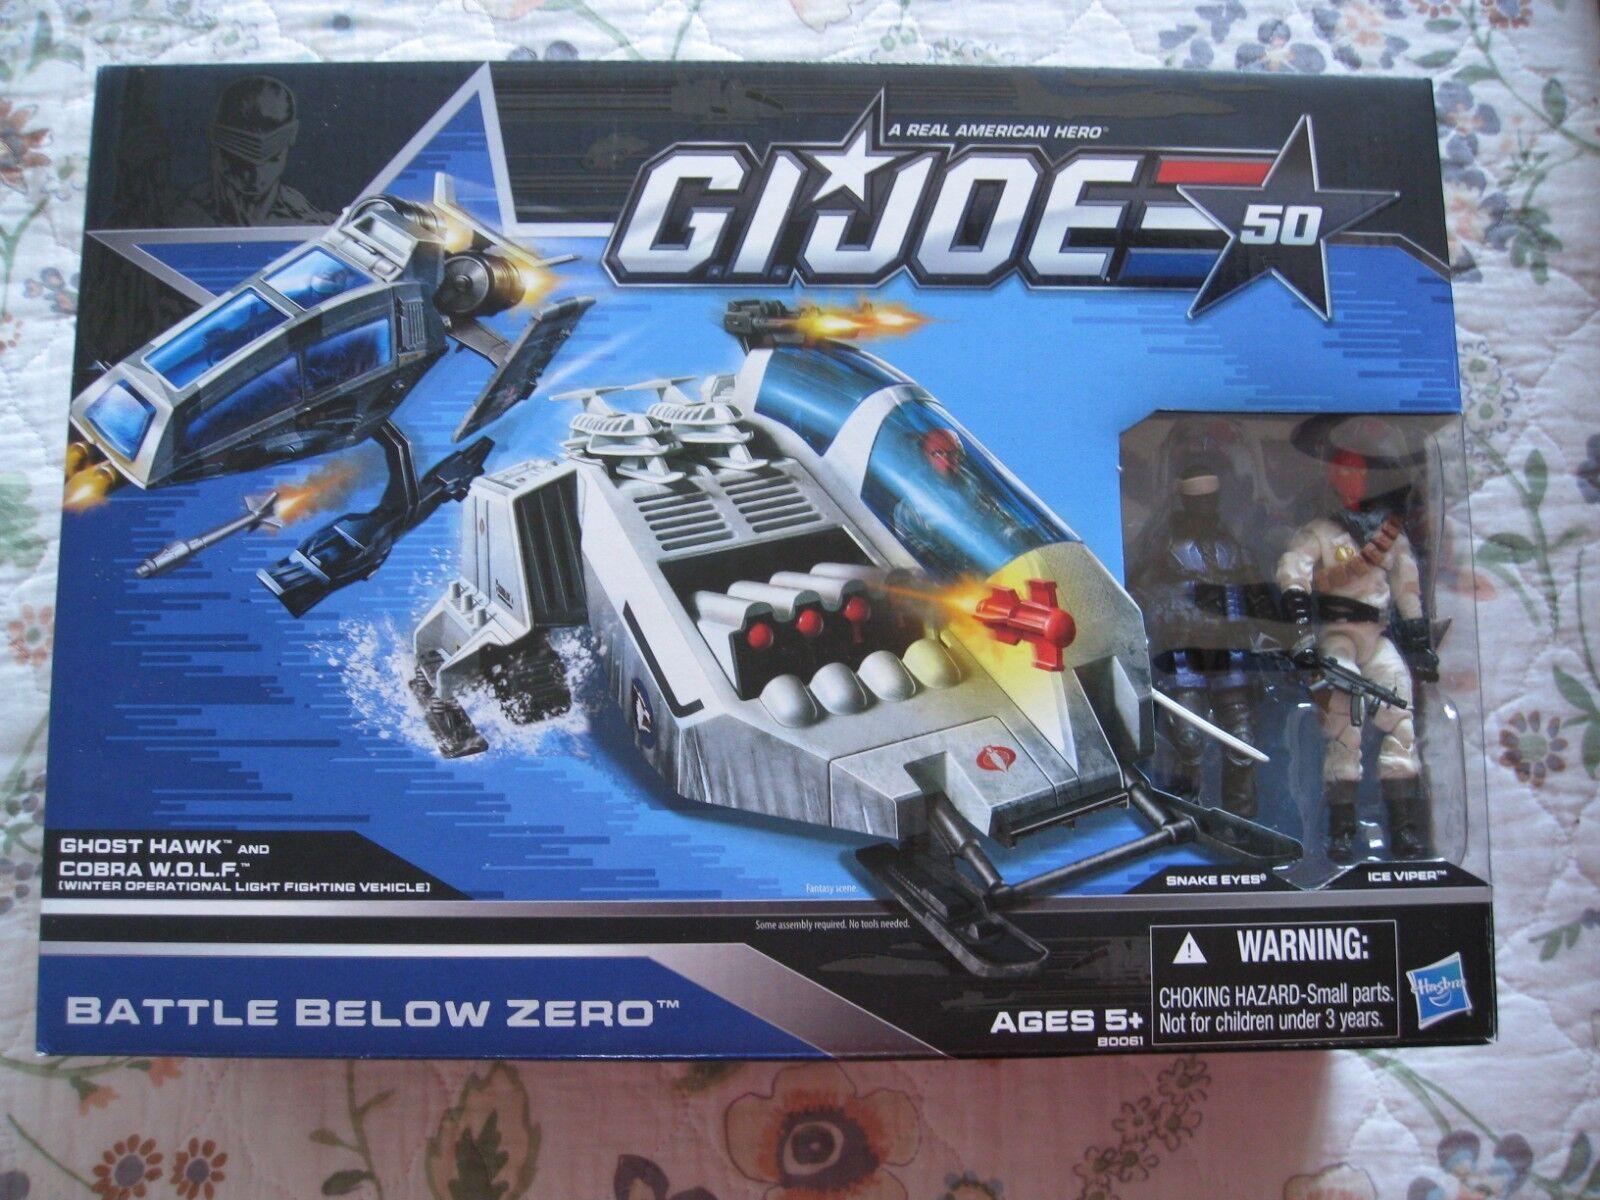 G.I. Joe 50TH Aniversario Batalla por debajo de cero fantasma Hawk & Cobra w.o.l.f.